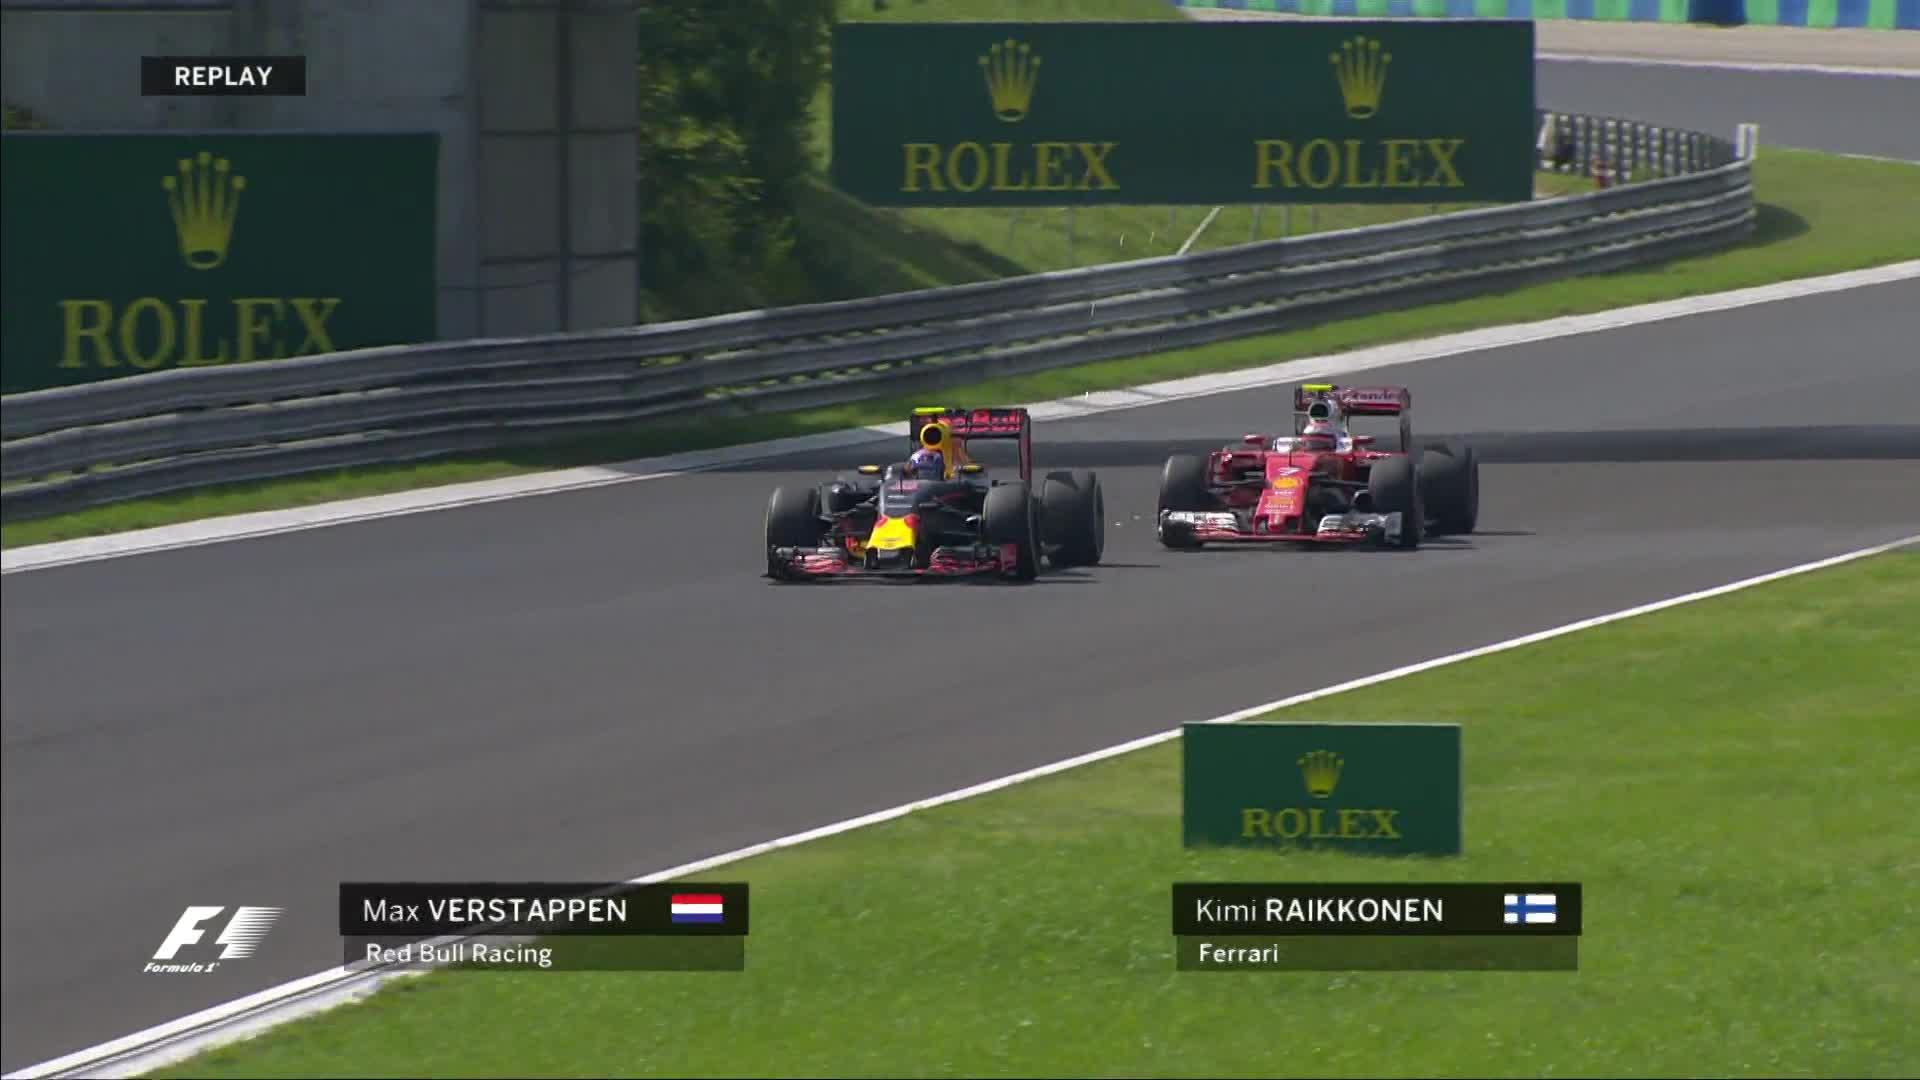 Verstappen Raikkonen overtake